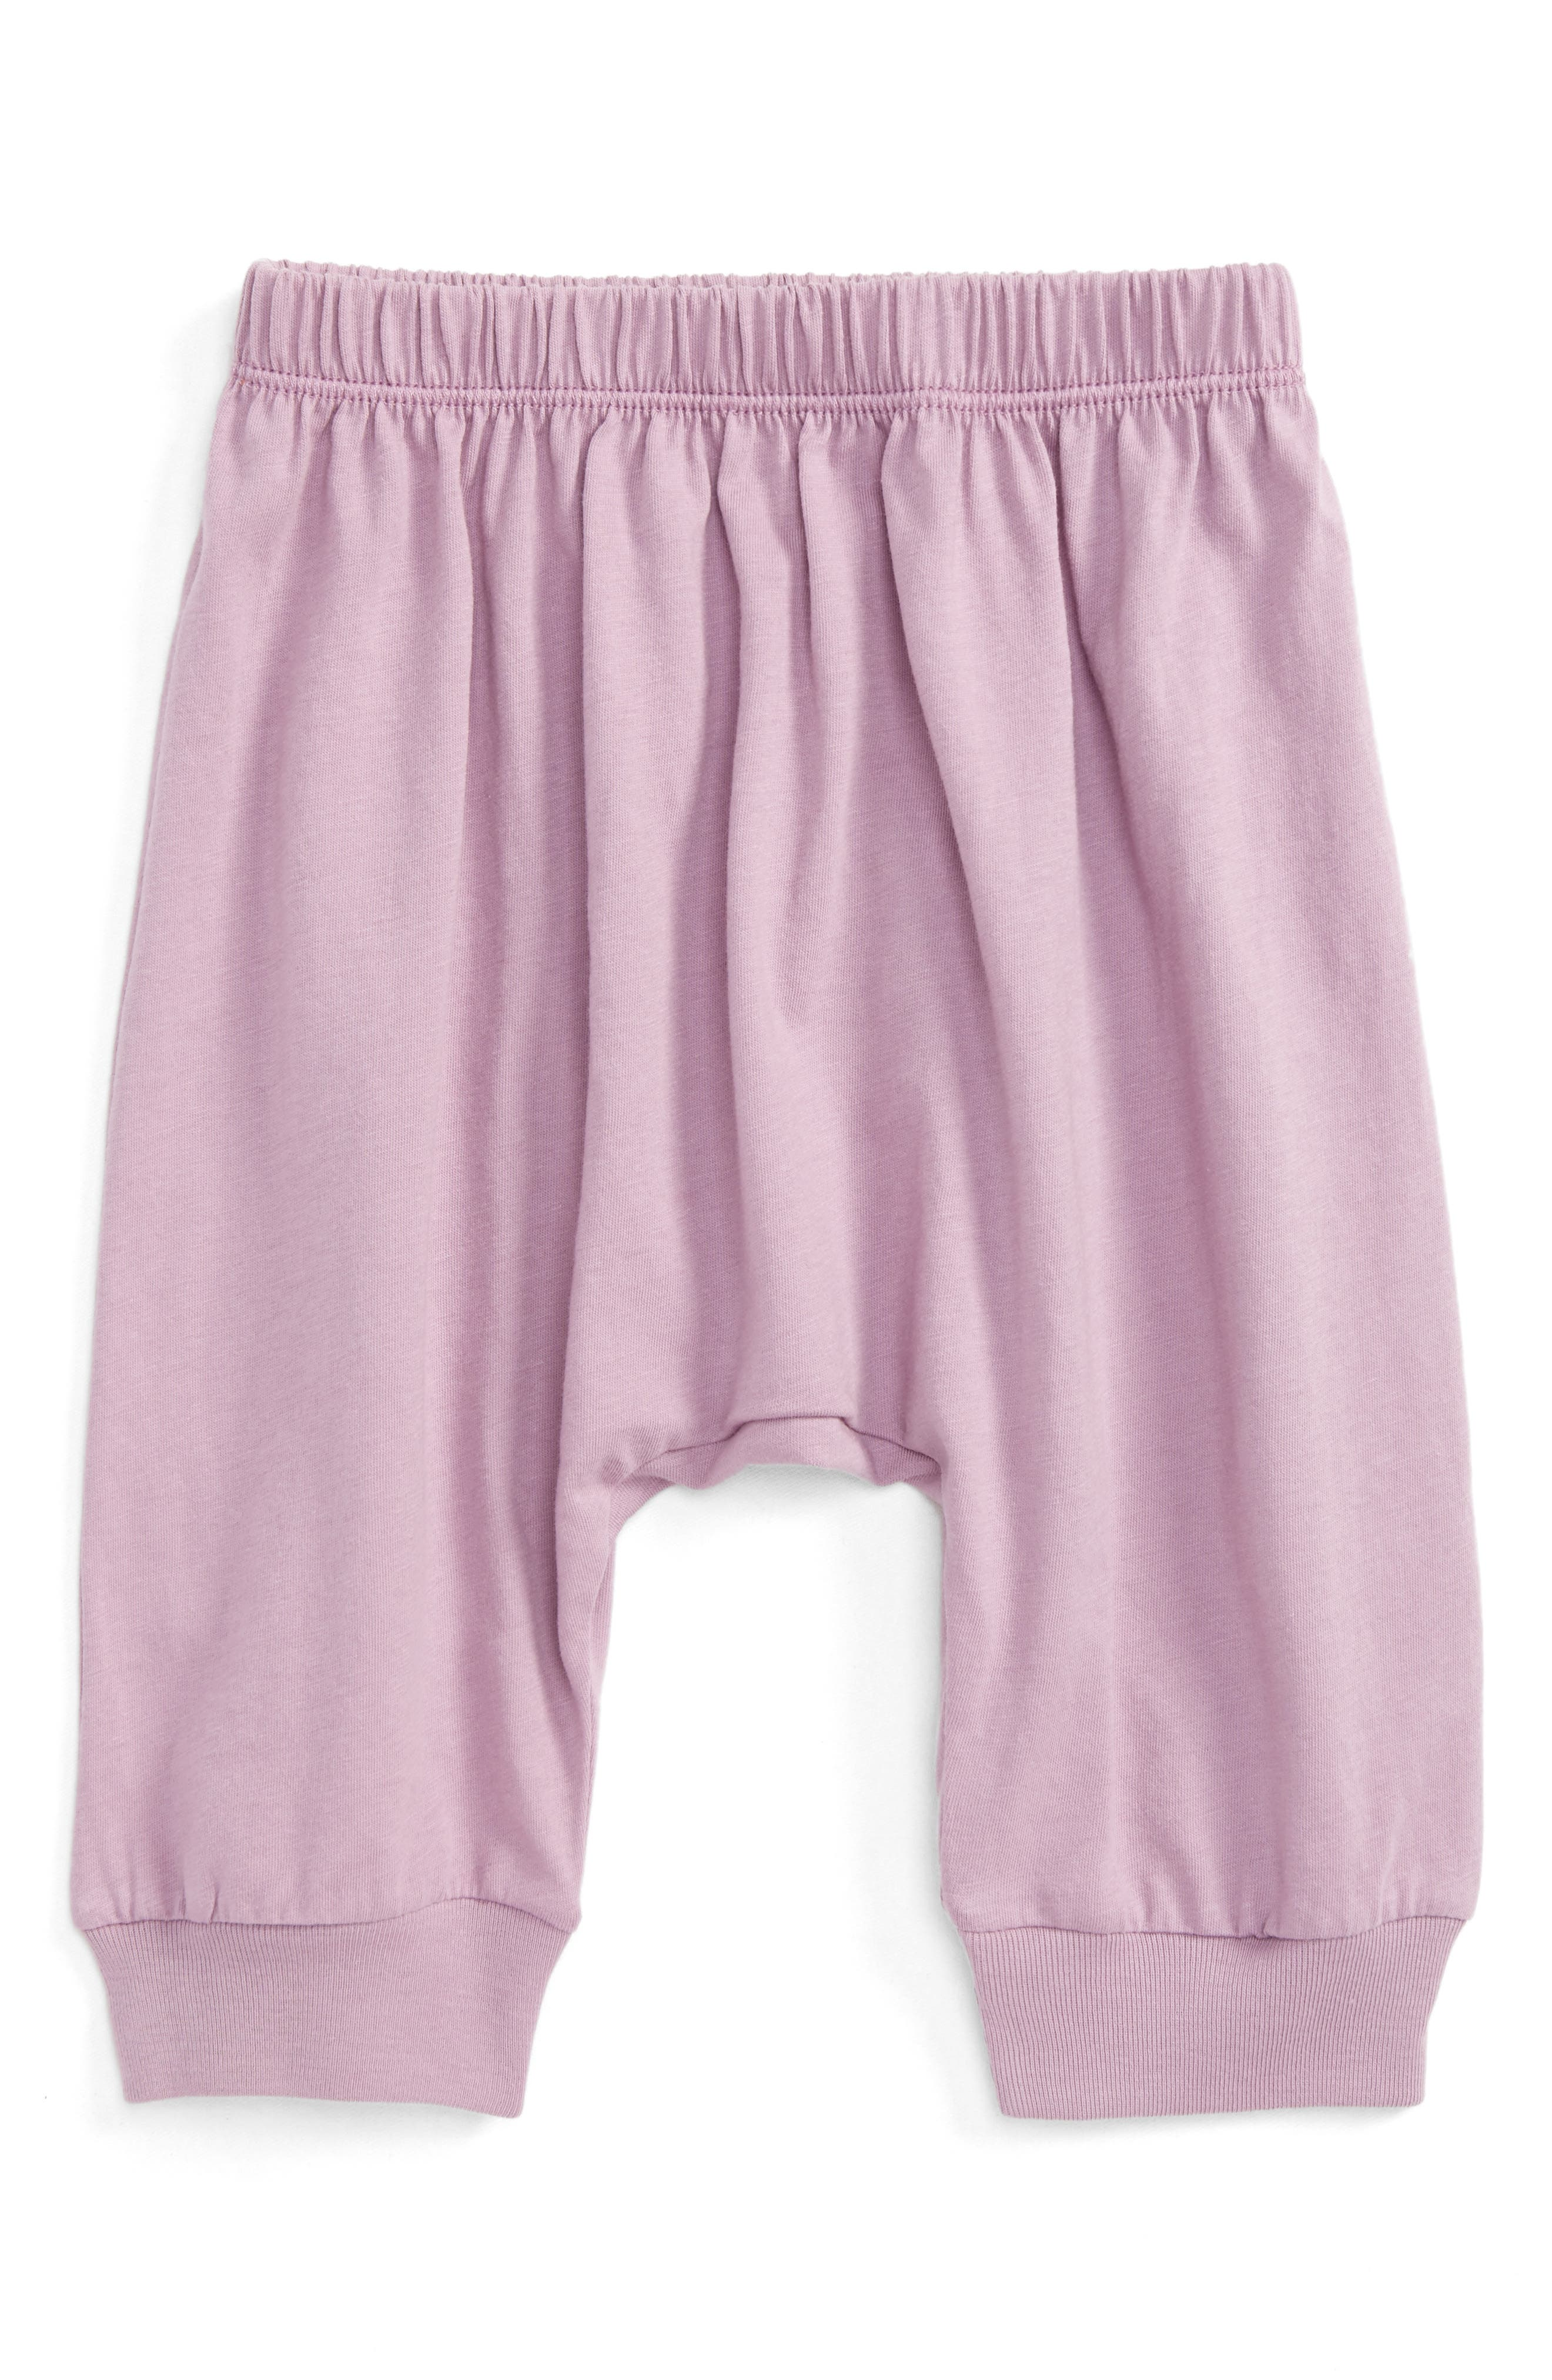 Alternate Image 1 Selected - Peek Little Peanut - Happy Pants (Baby)